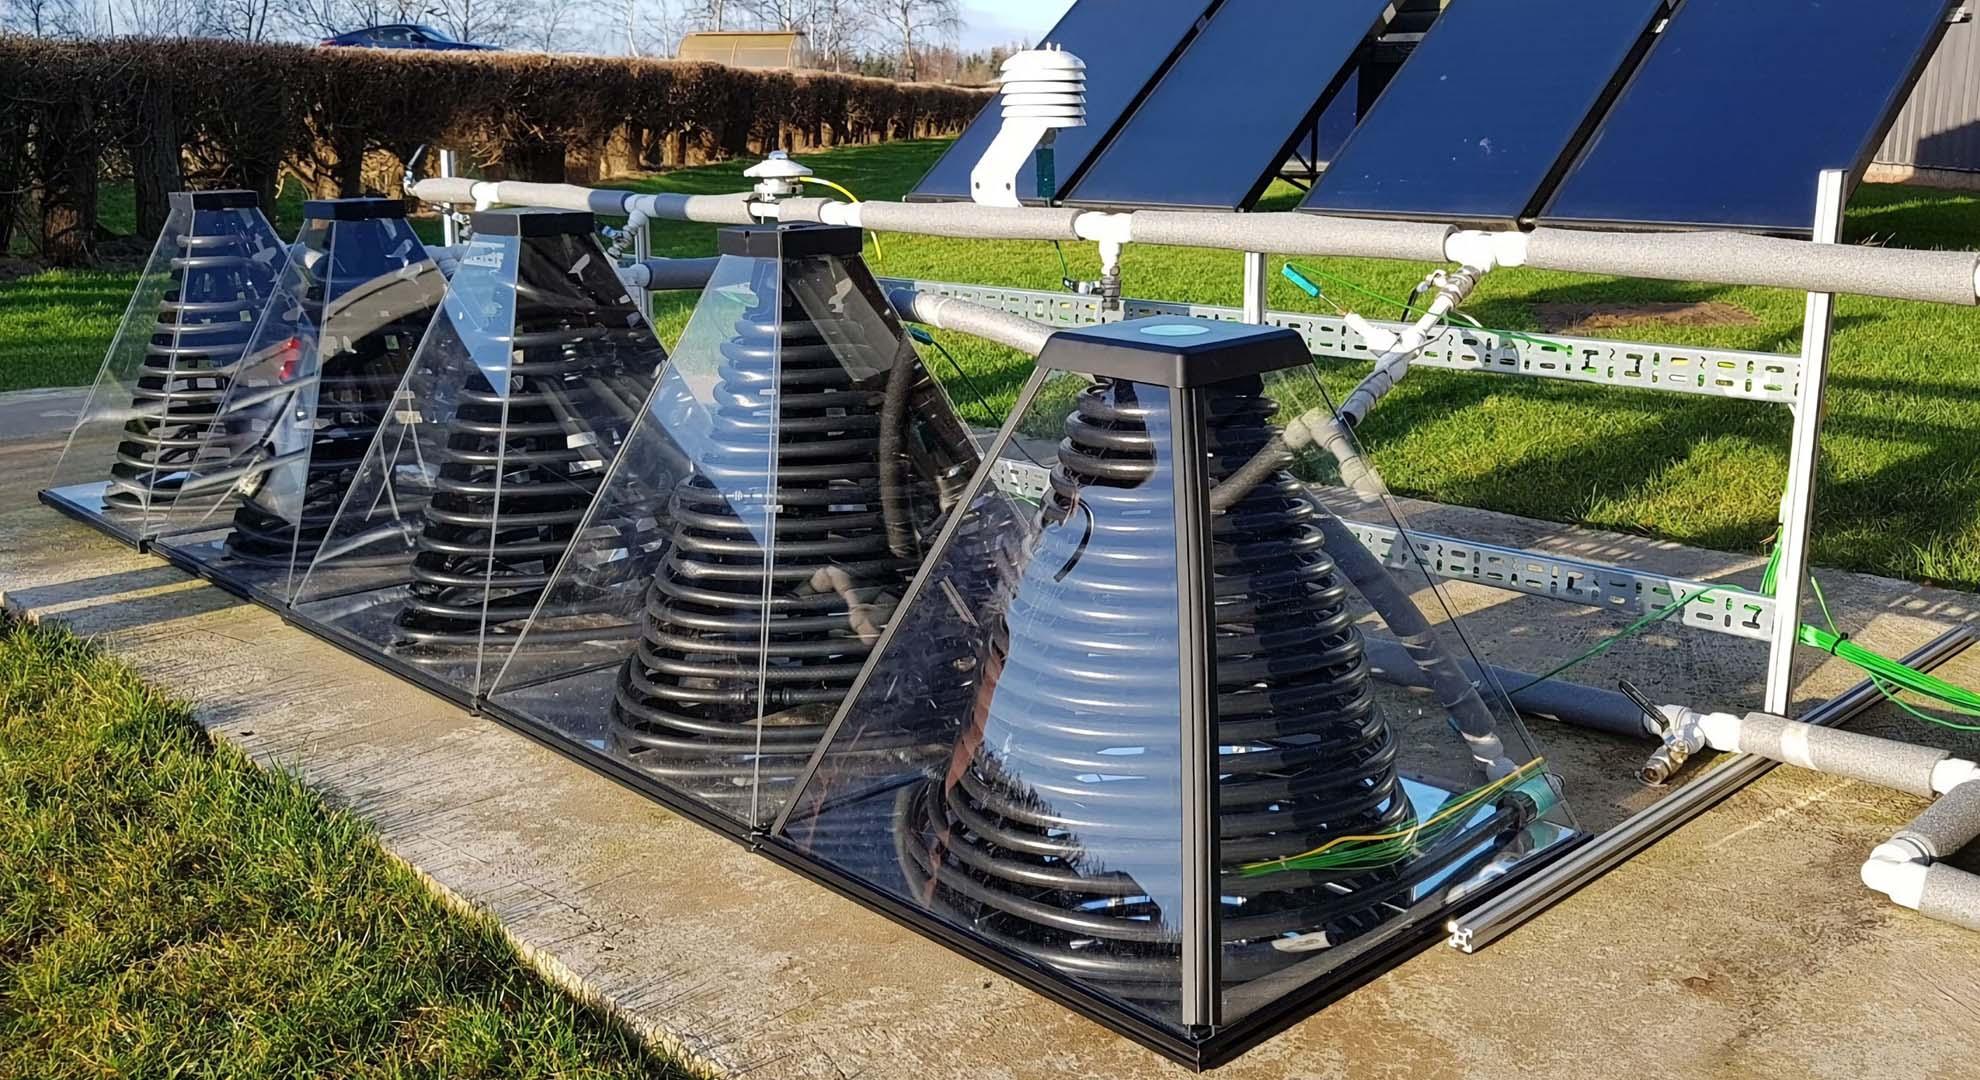 Colector térmico solar ensamblable SolarisKit. Imagen SolarisKit Ltd (www.solariskit.com)